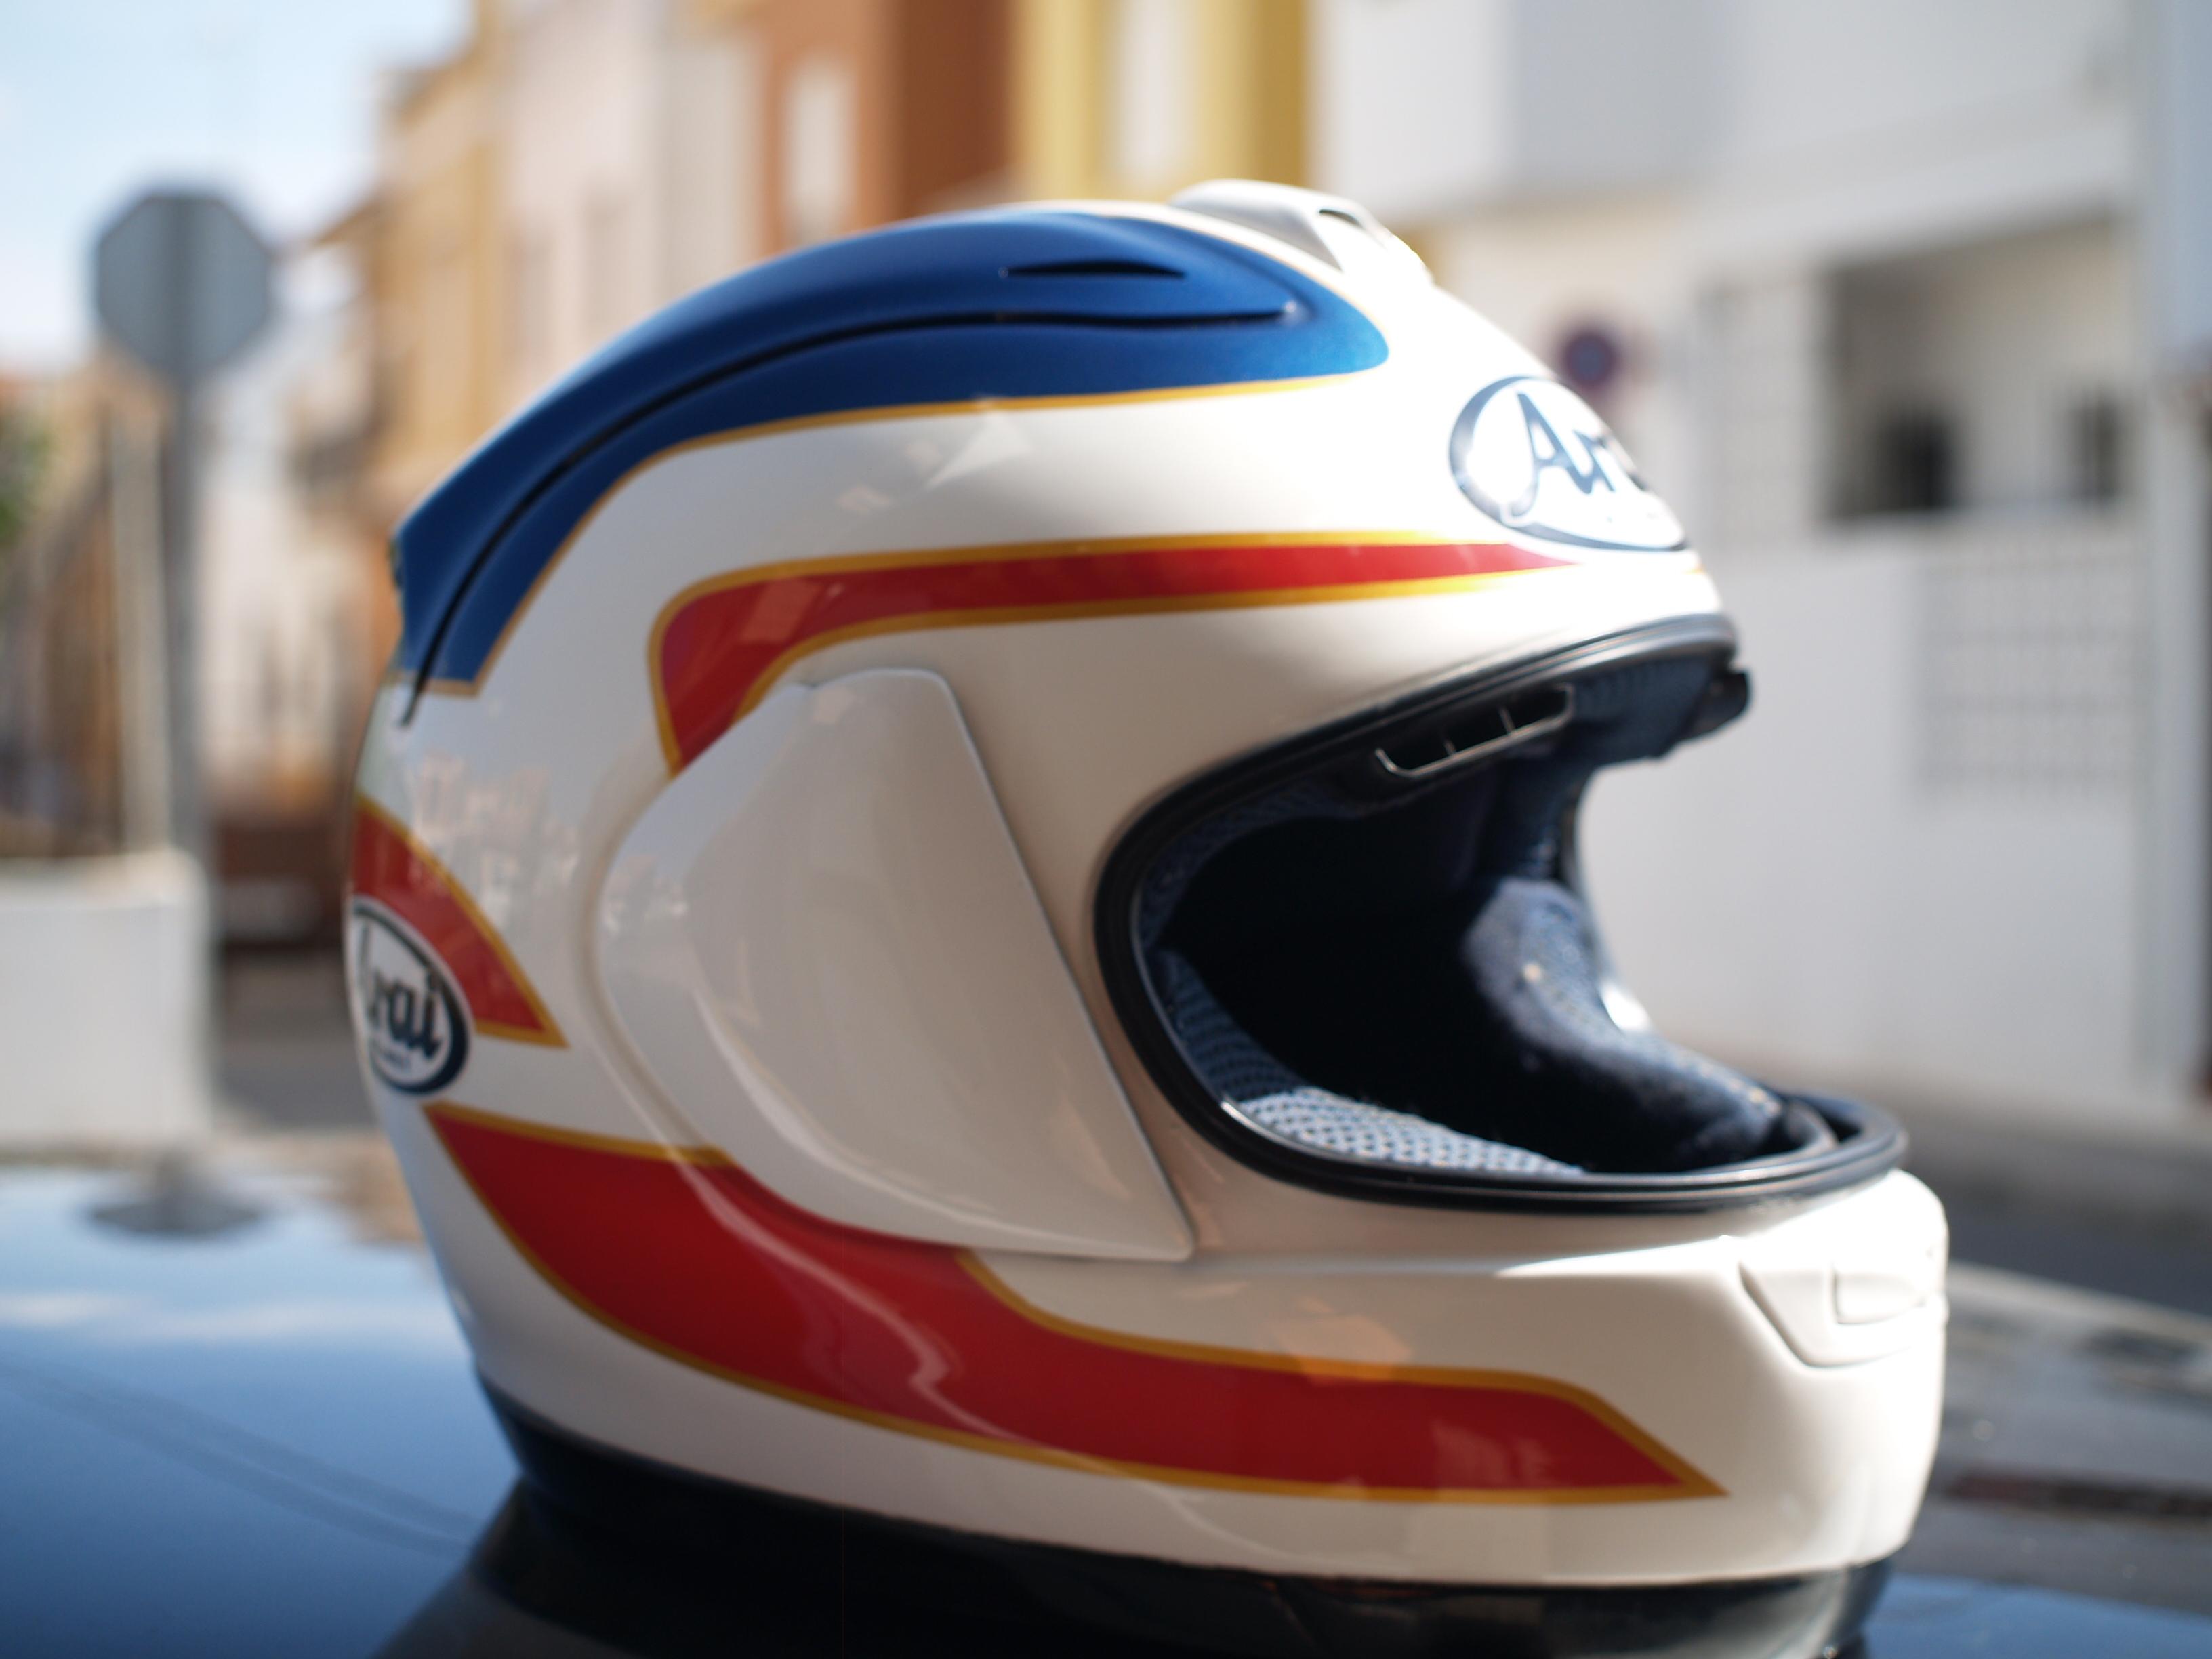 Pintura casco Arai RX-7 Freddie Spencer (Réplica)